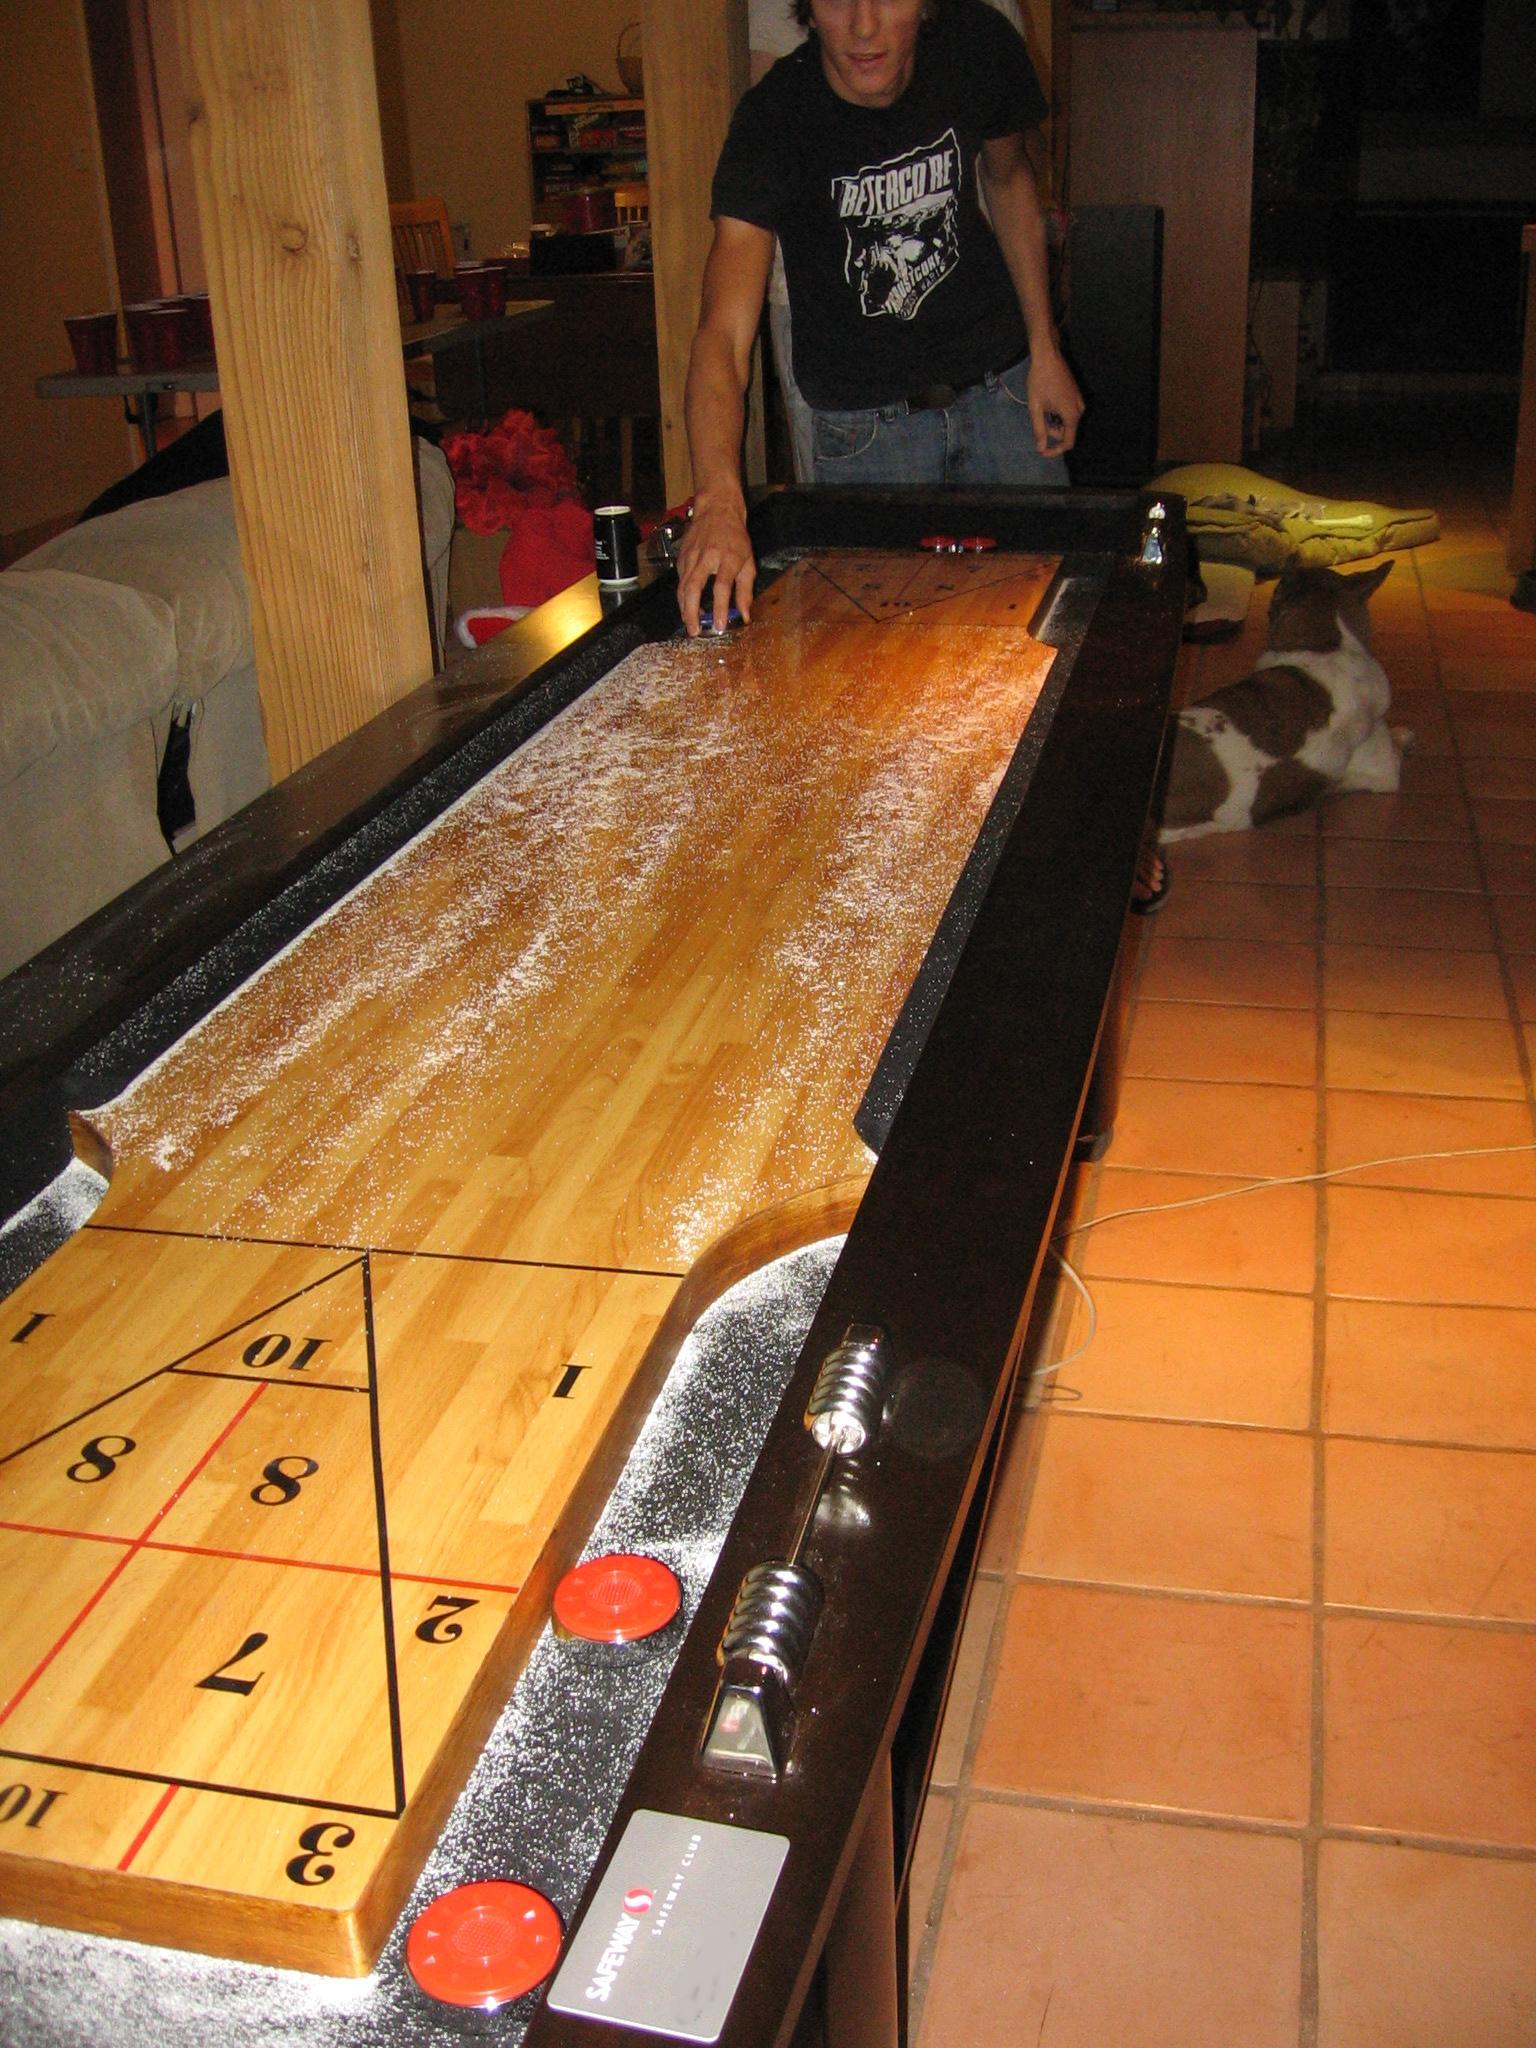 File:TableShuffleboard WithBankboard.JPG